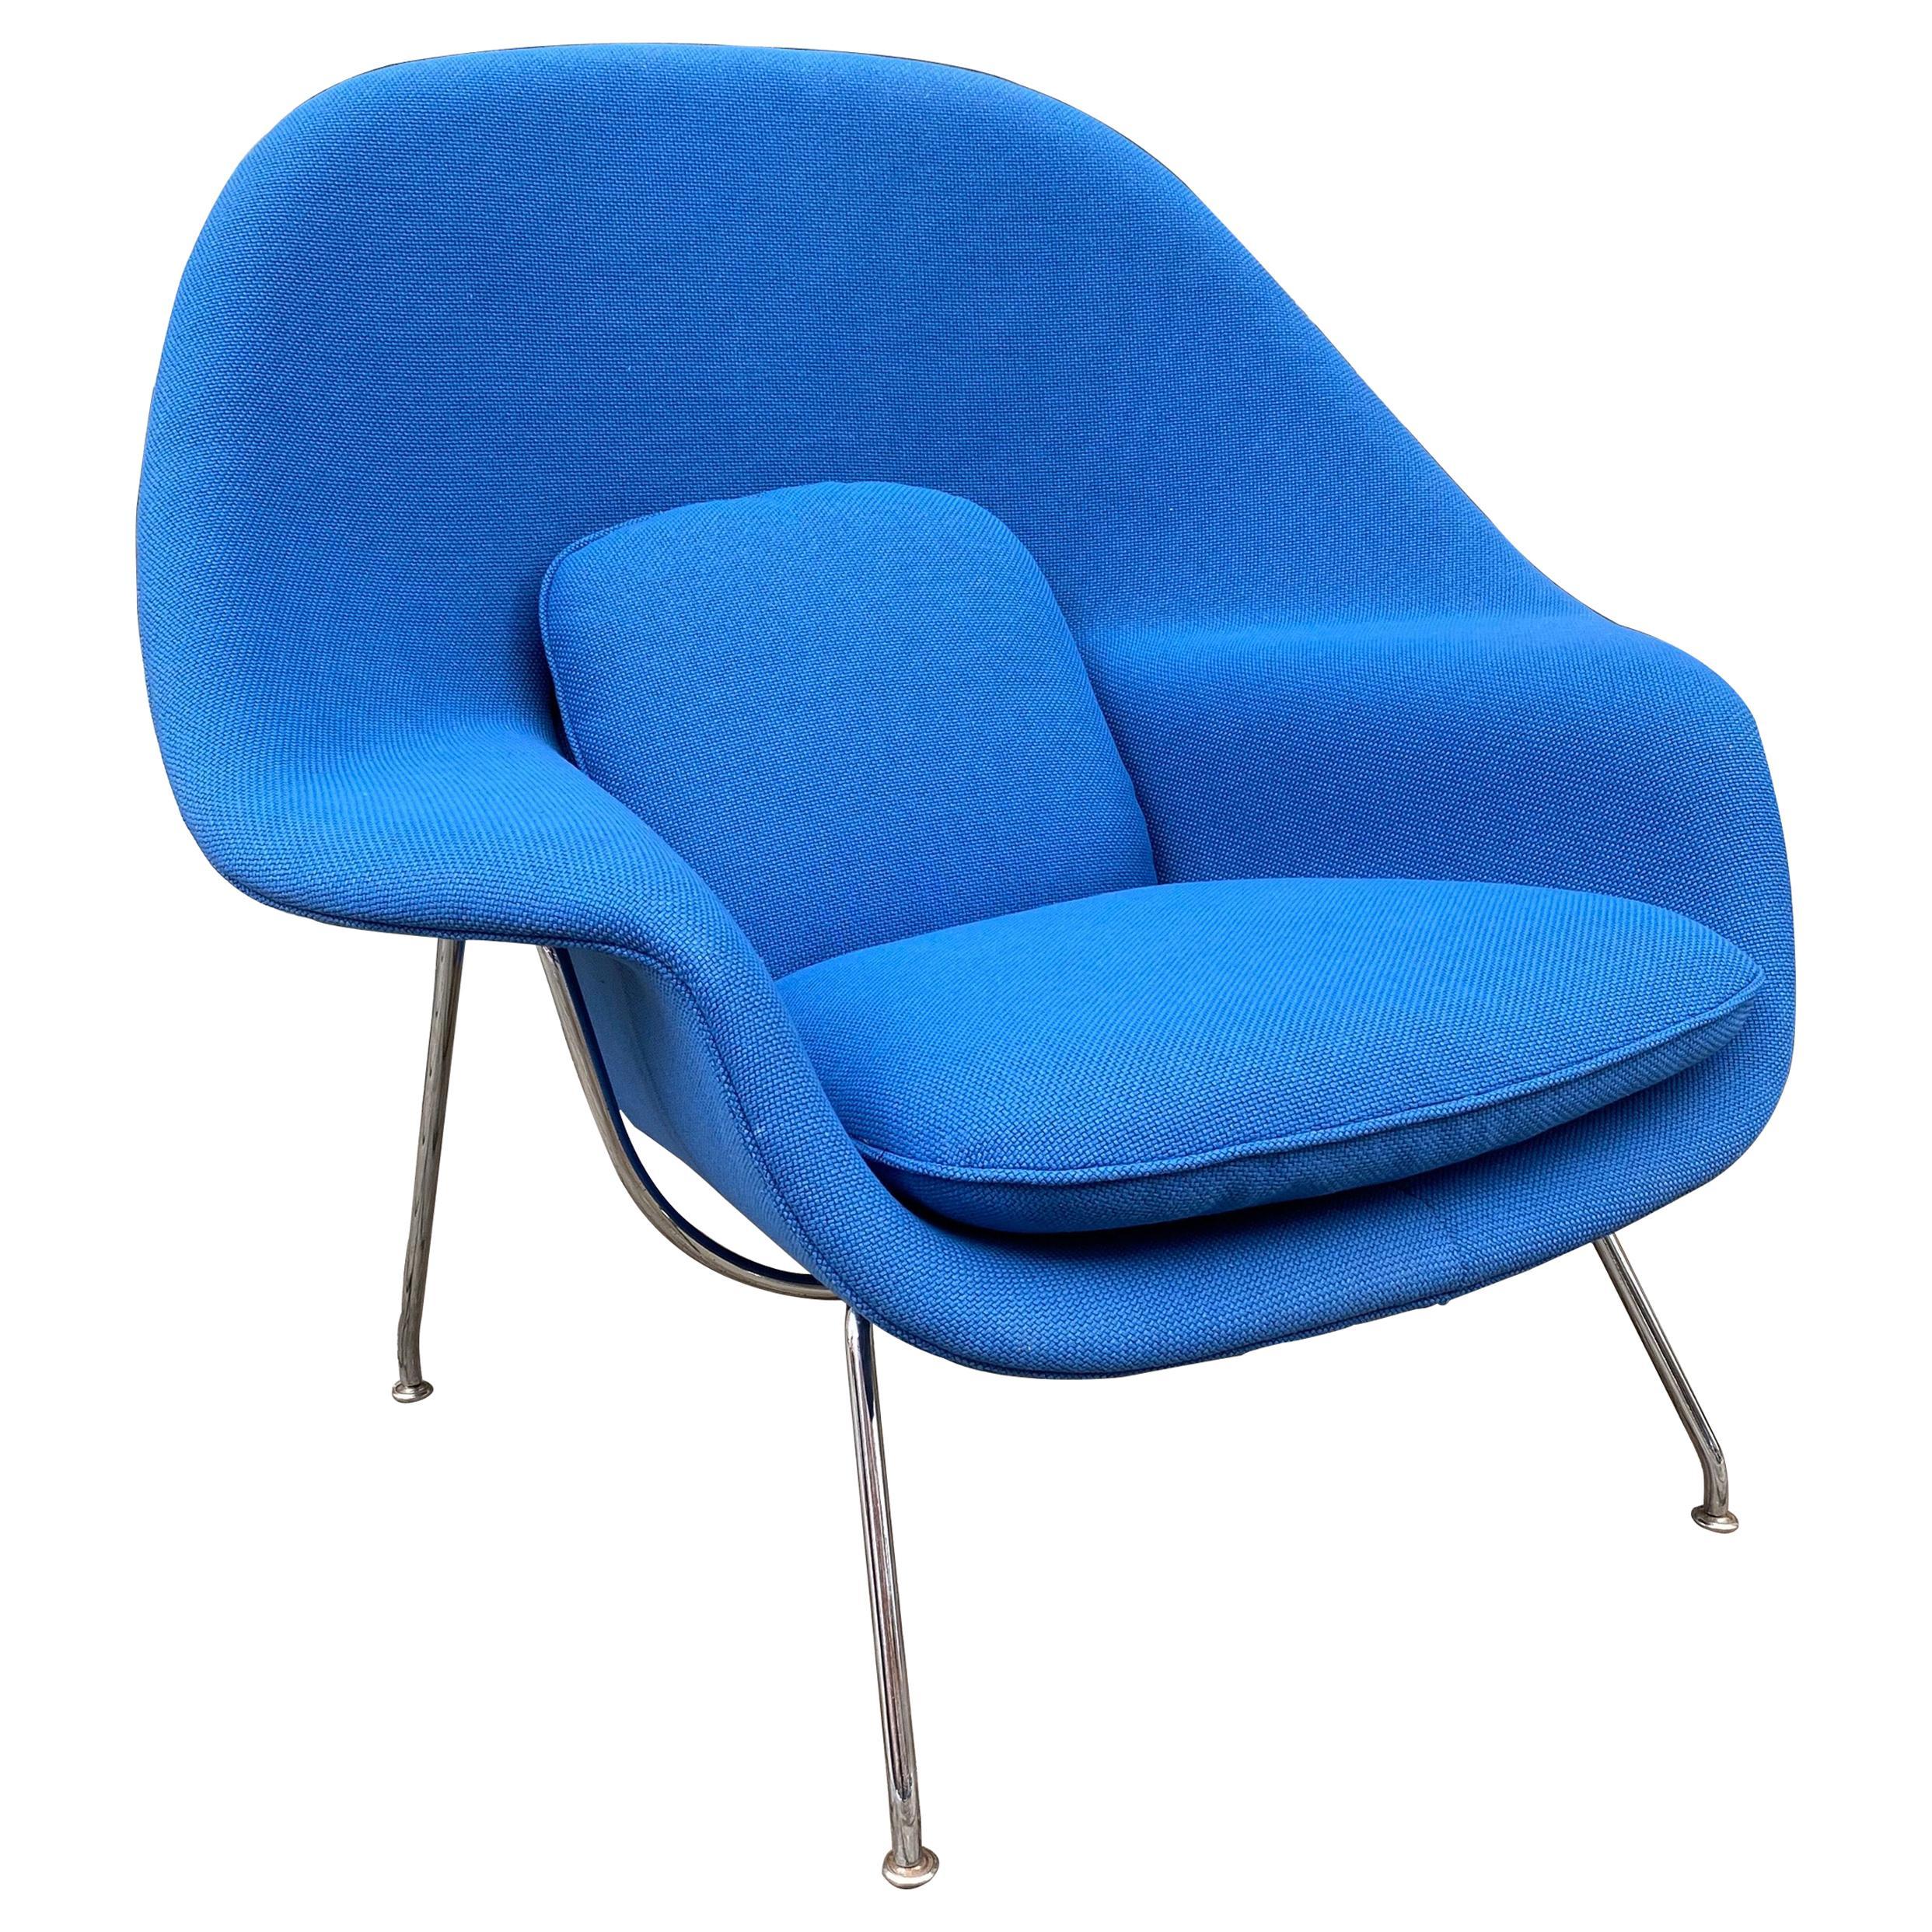 Eero Saarinen for Knoll Womb Chair/ New Upholstery